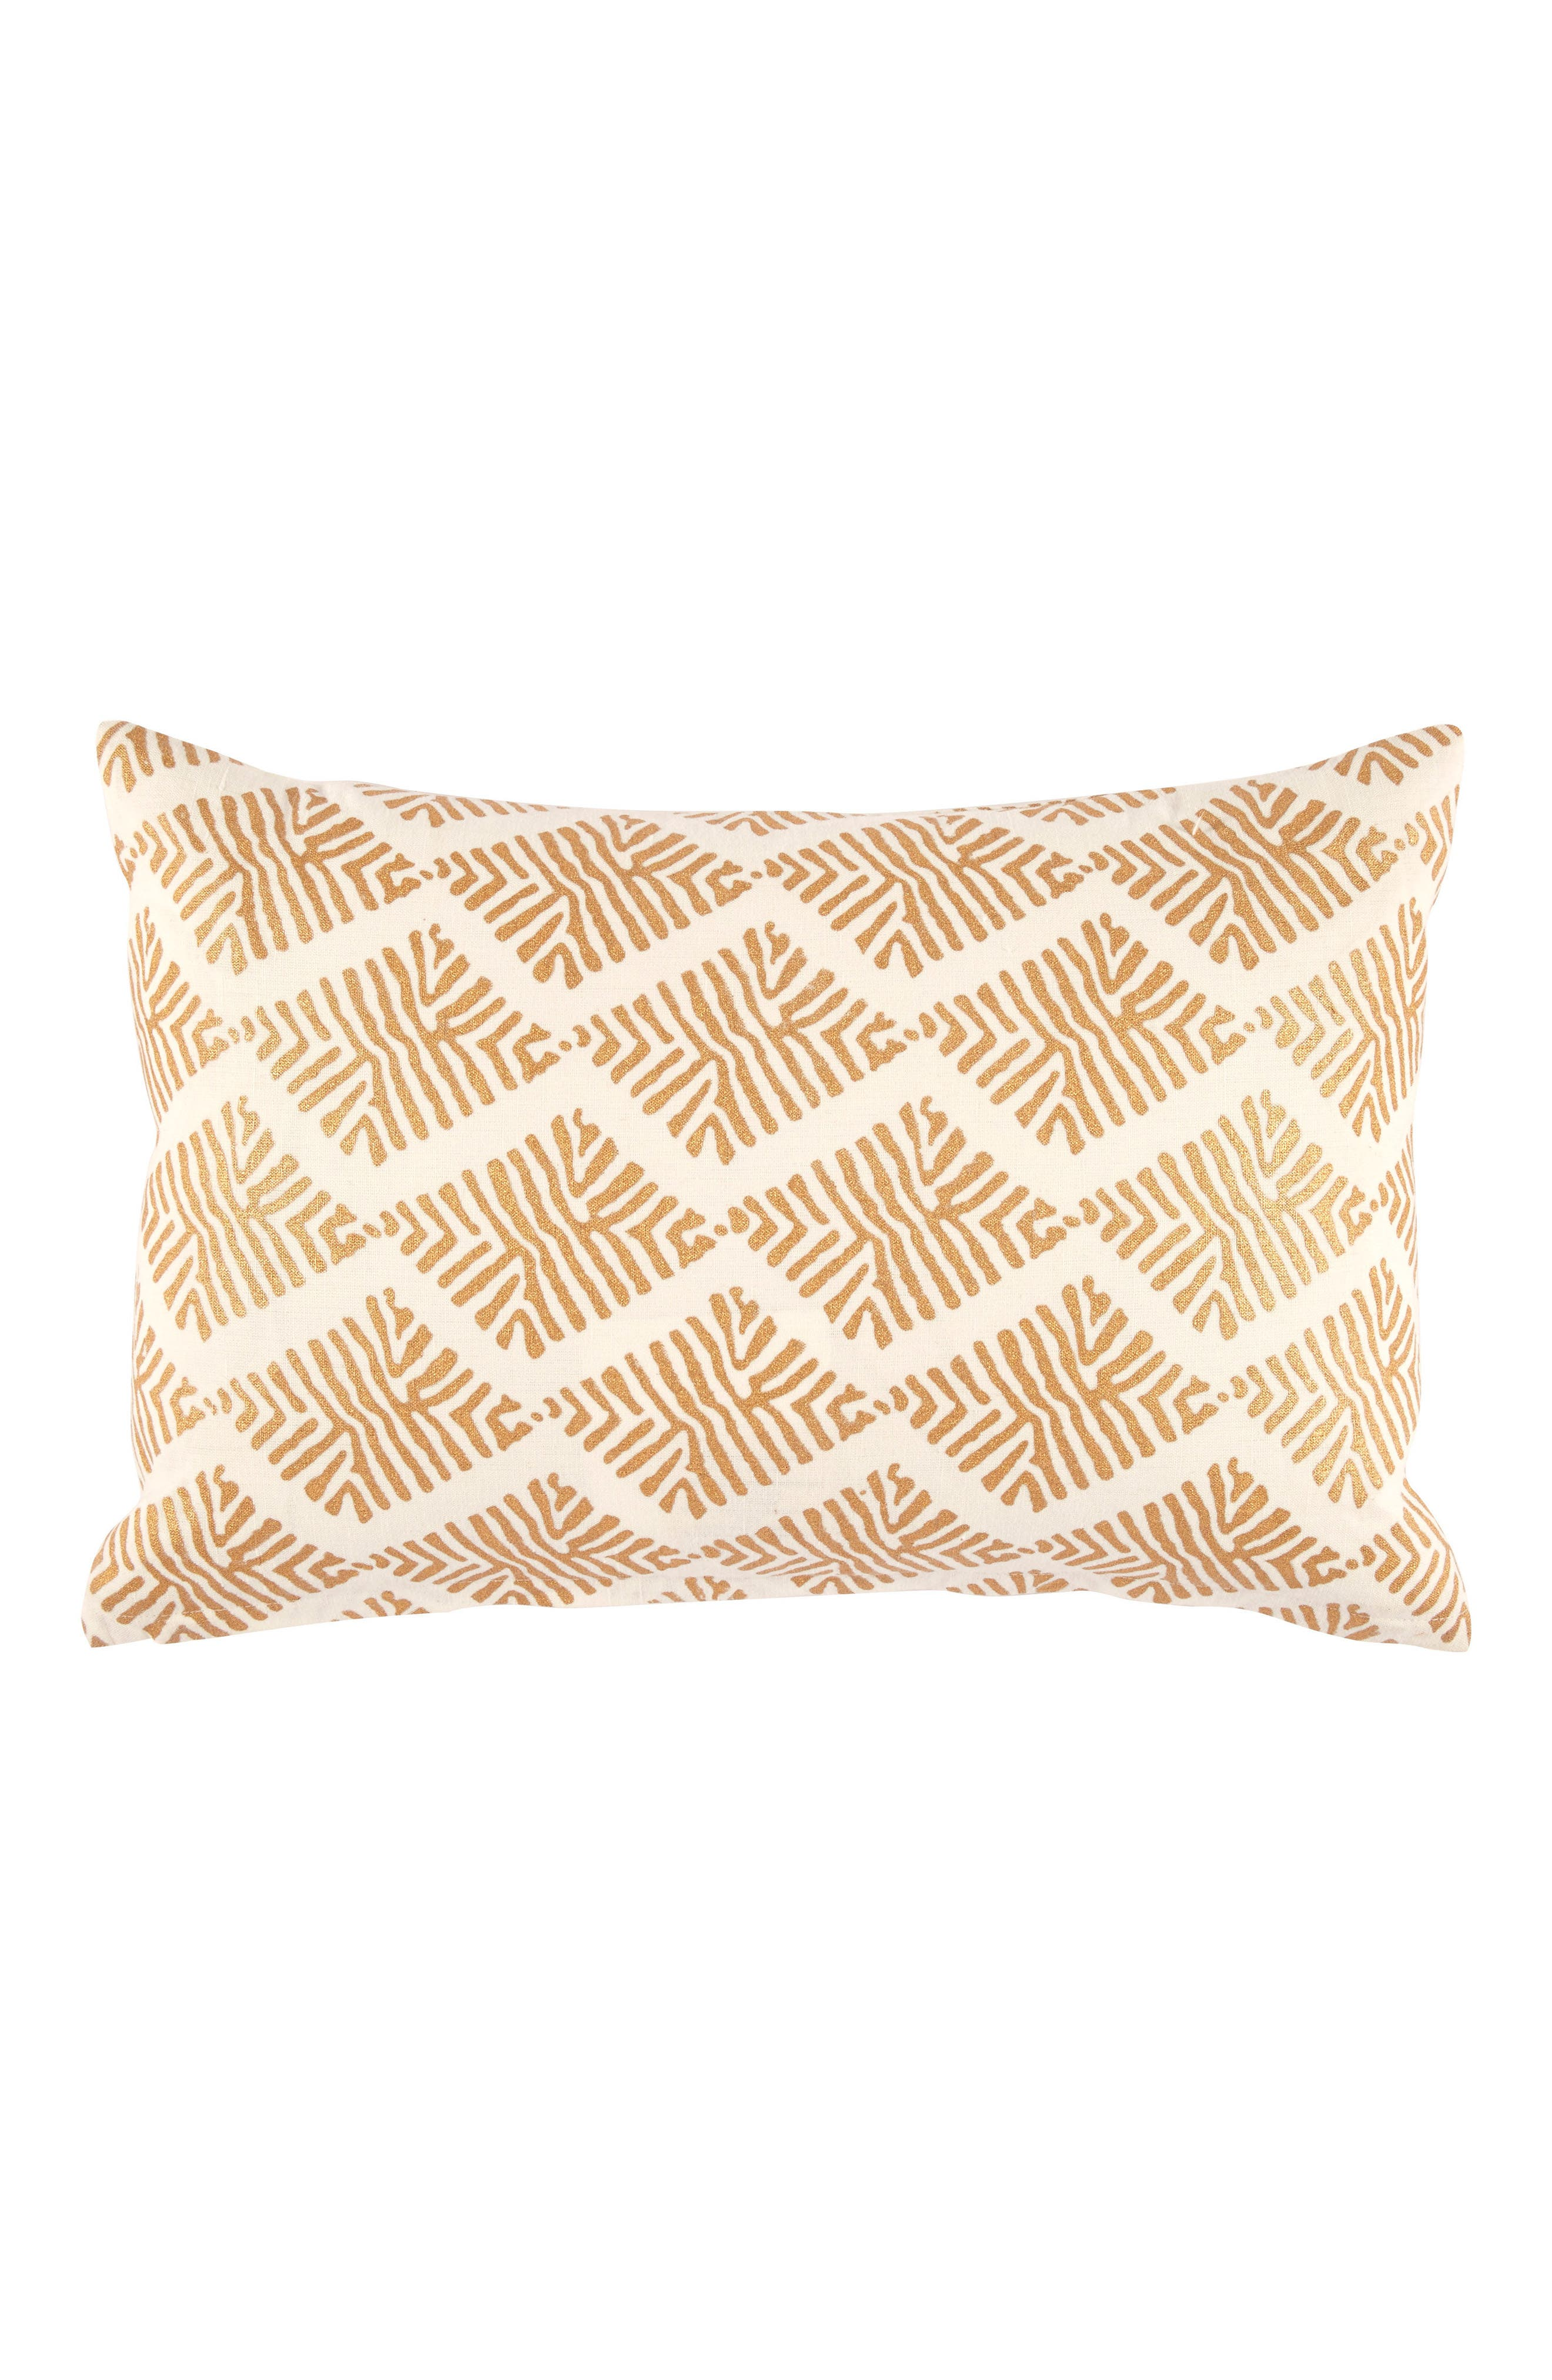 John Robshaw Sharak Accent Pillow